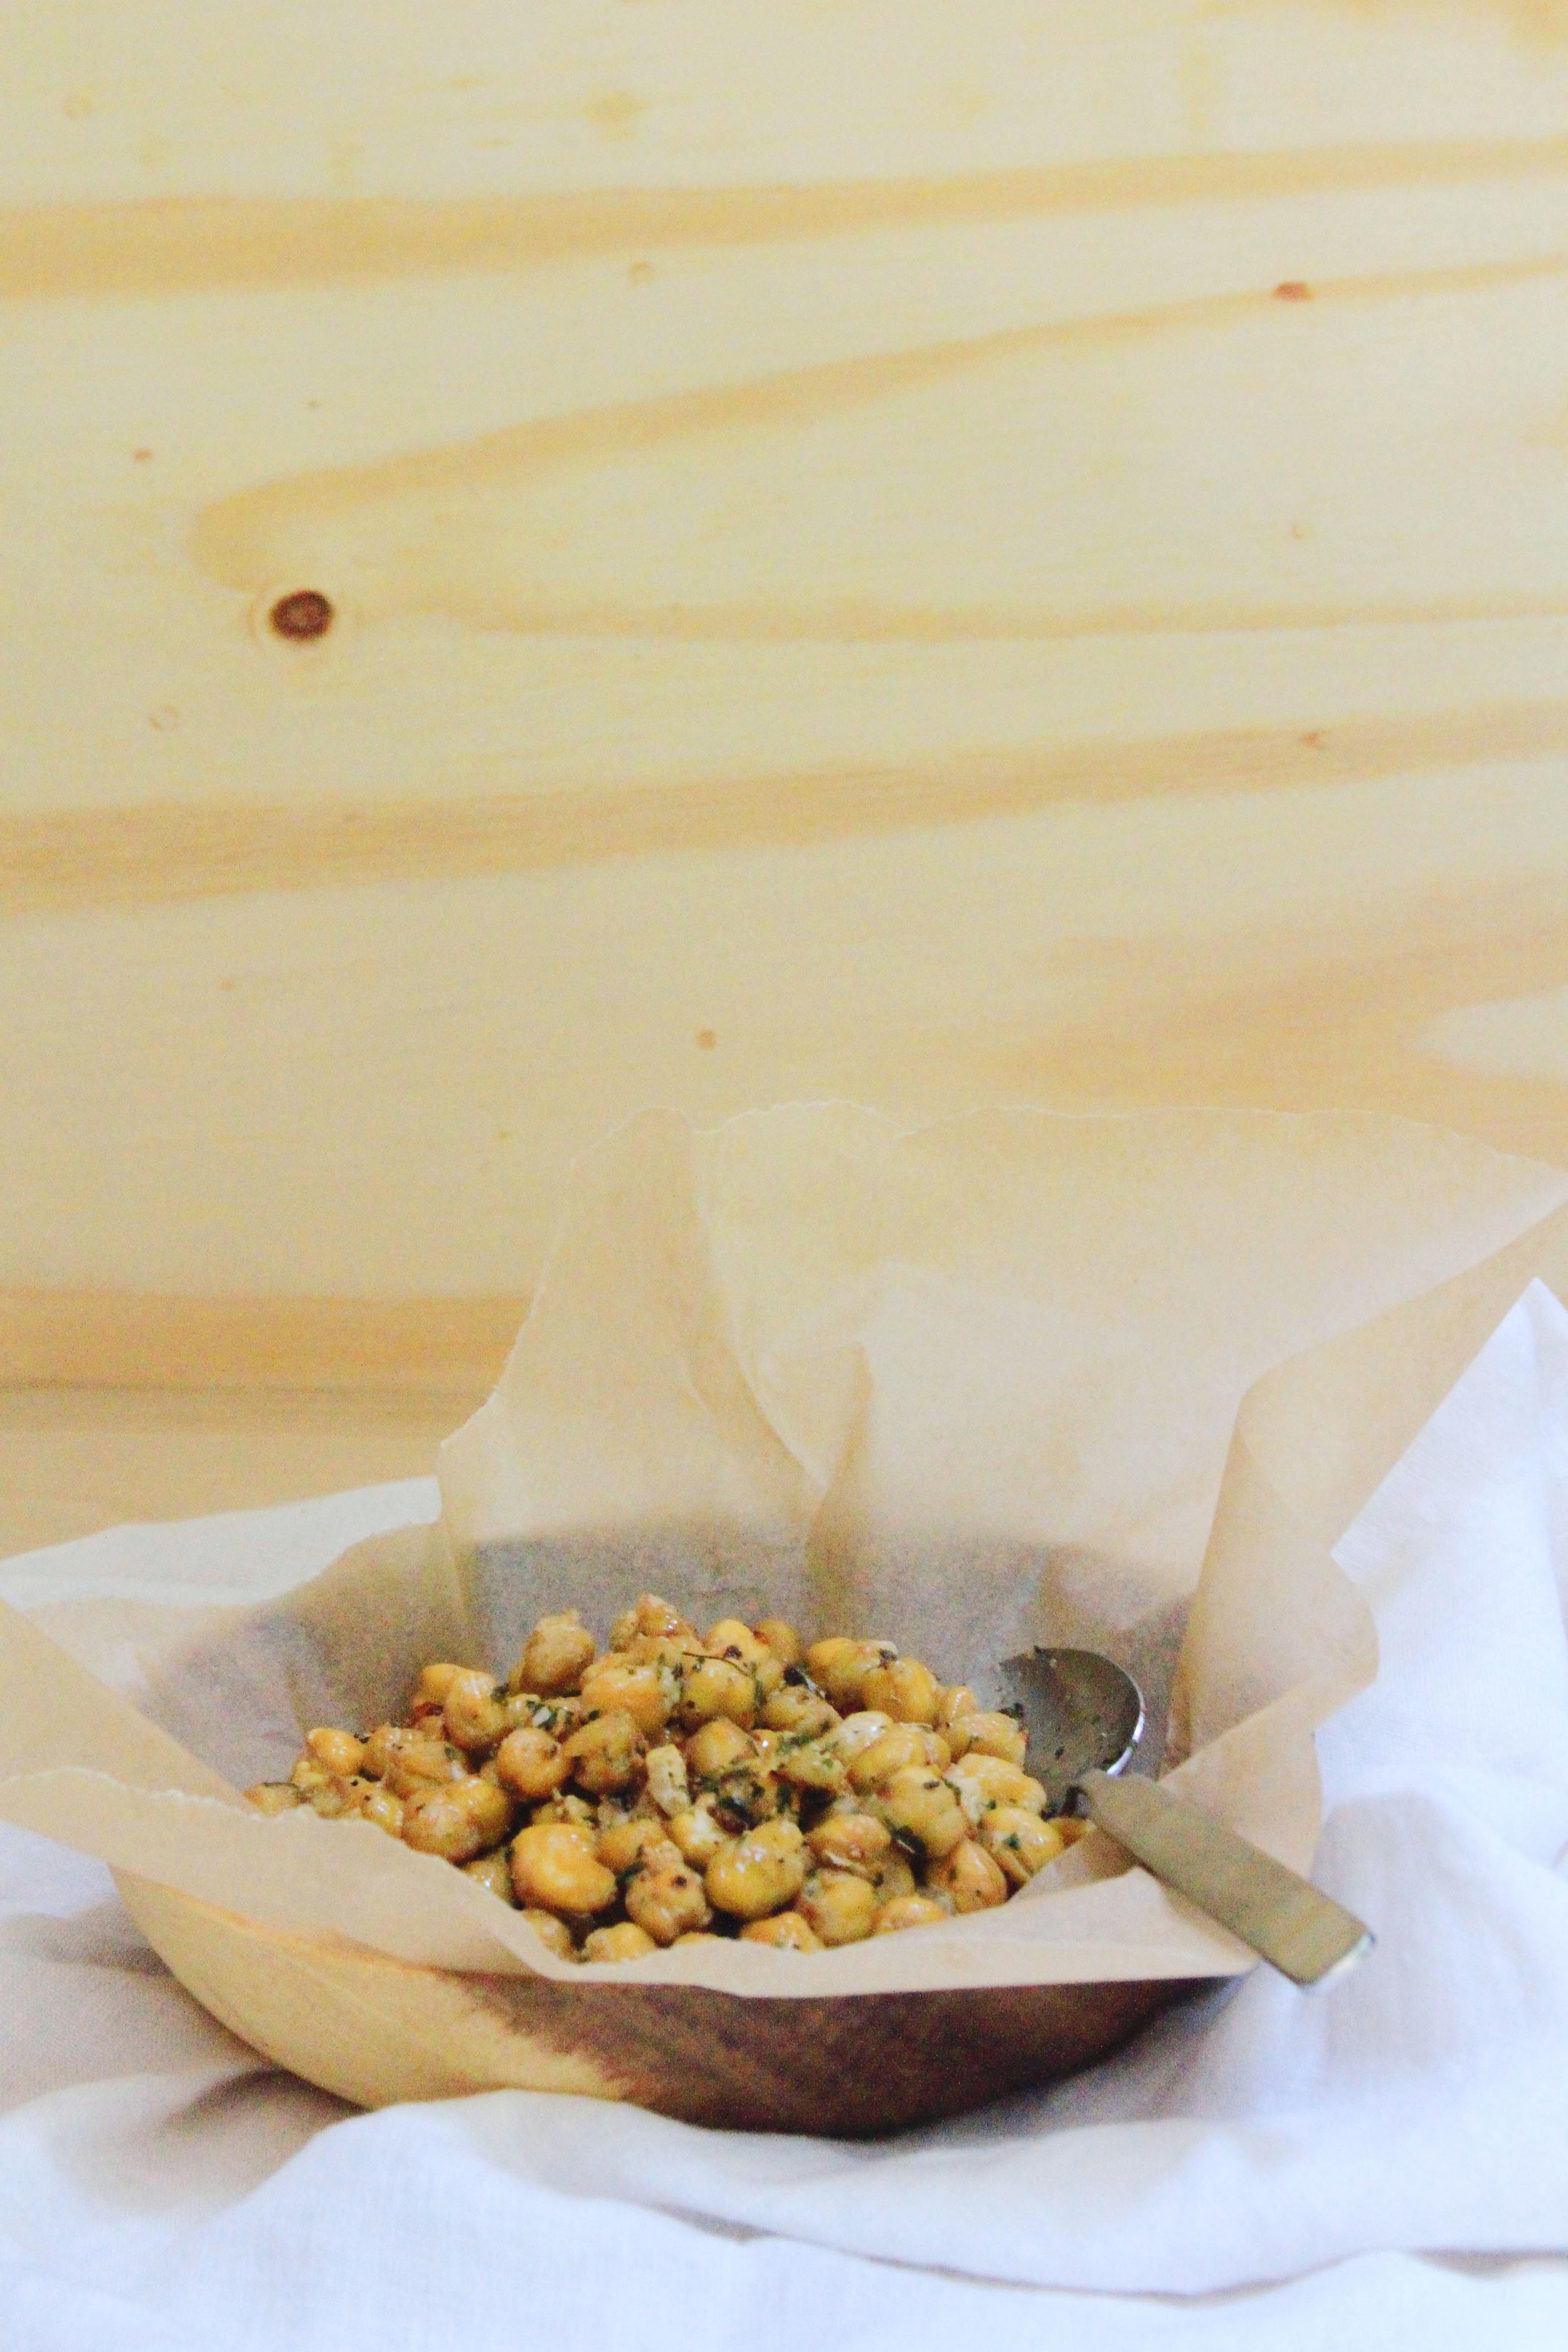 Garlic and parsley chickpeas